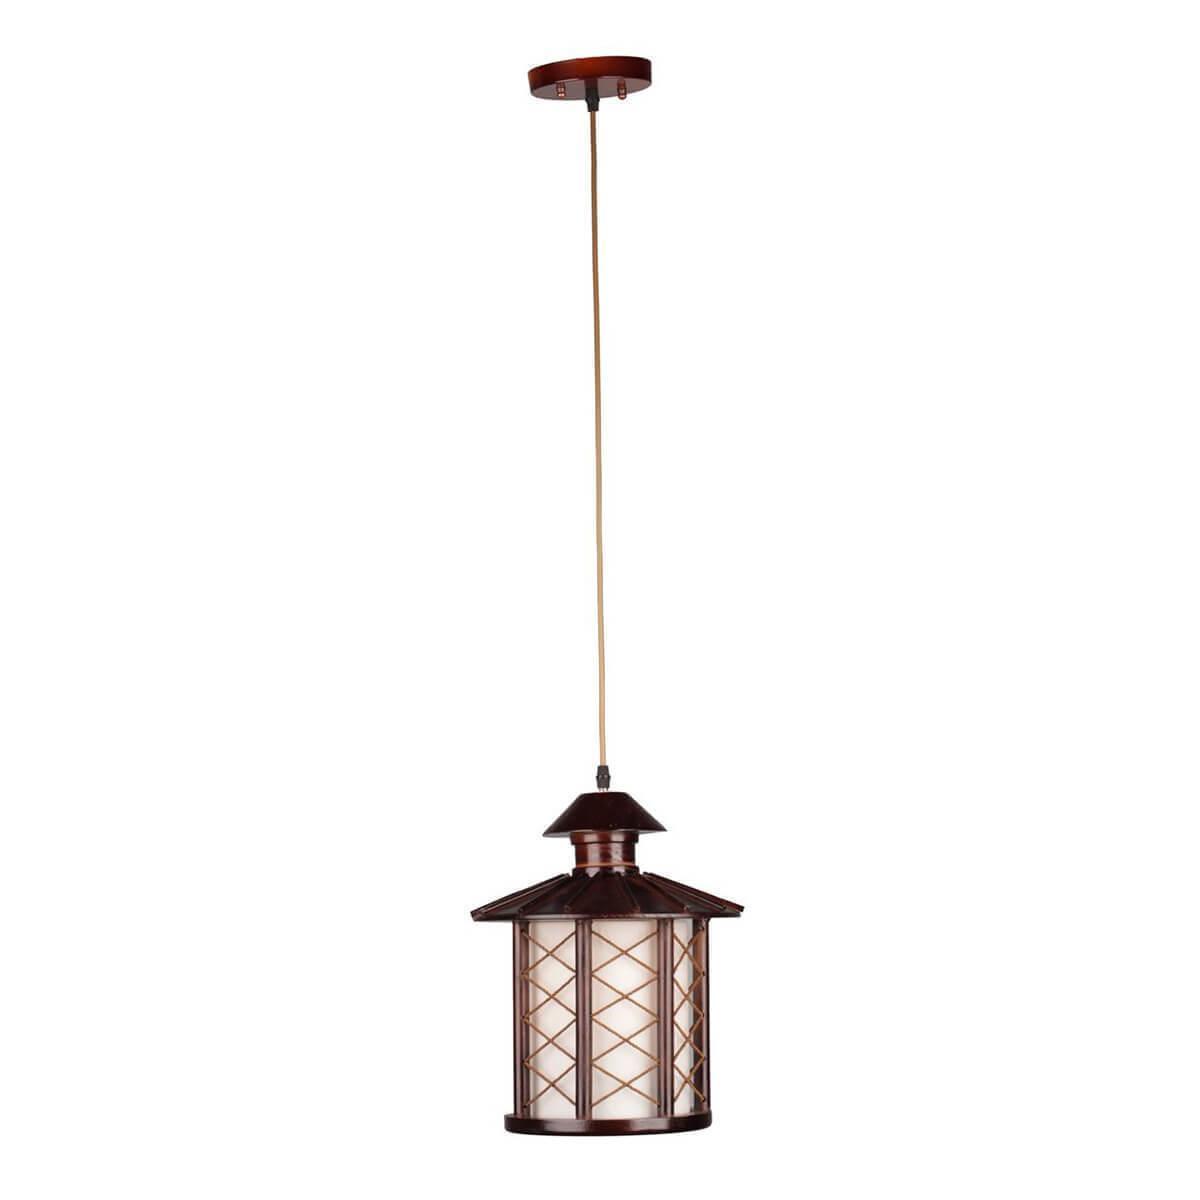 Подвесной светильник Omnilux OML-58206-01, E27, 40 Вт